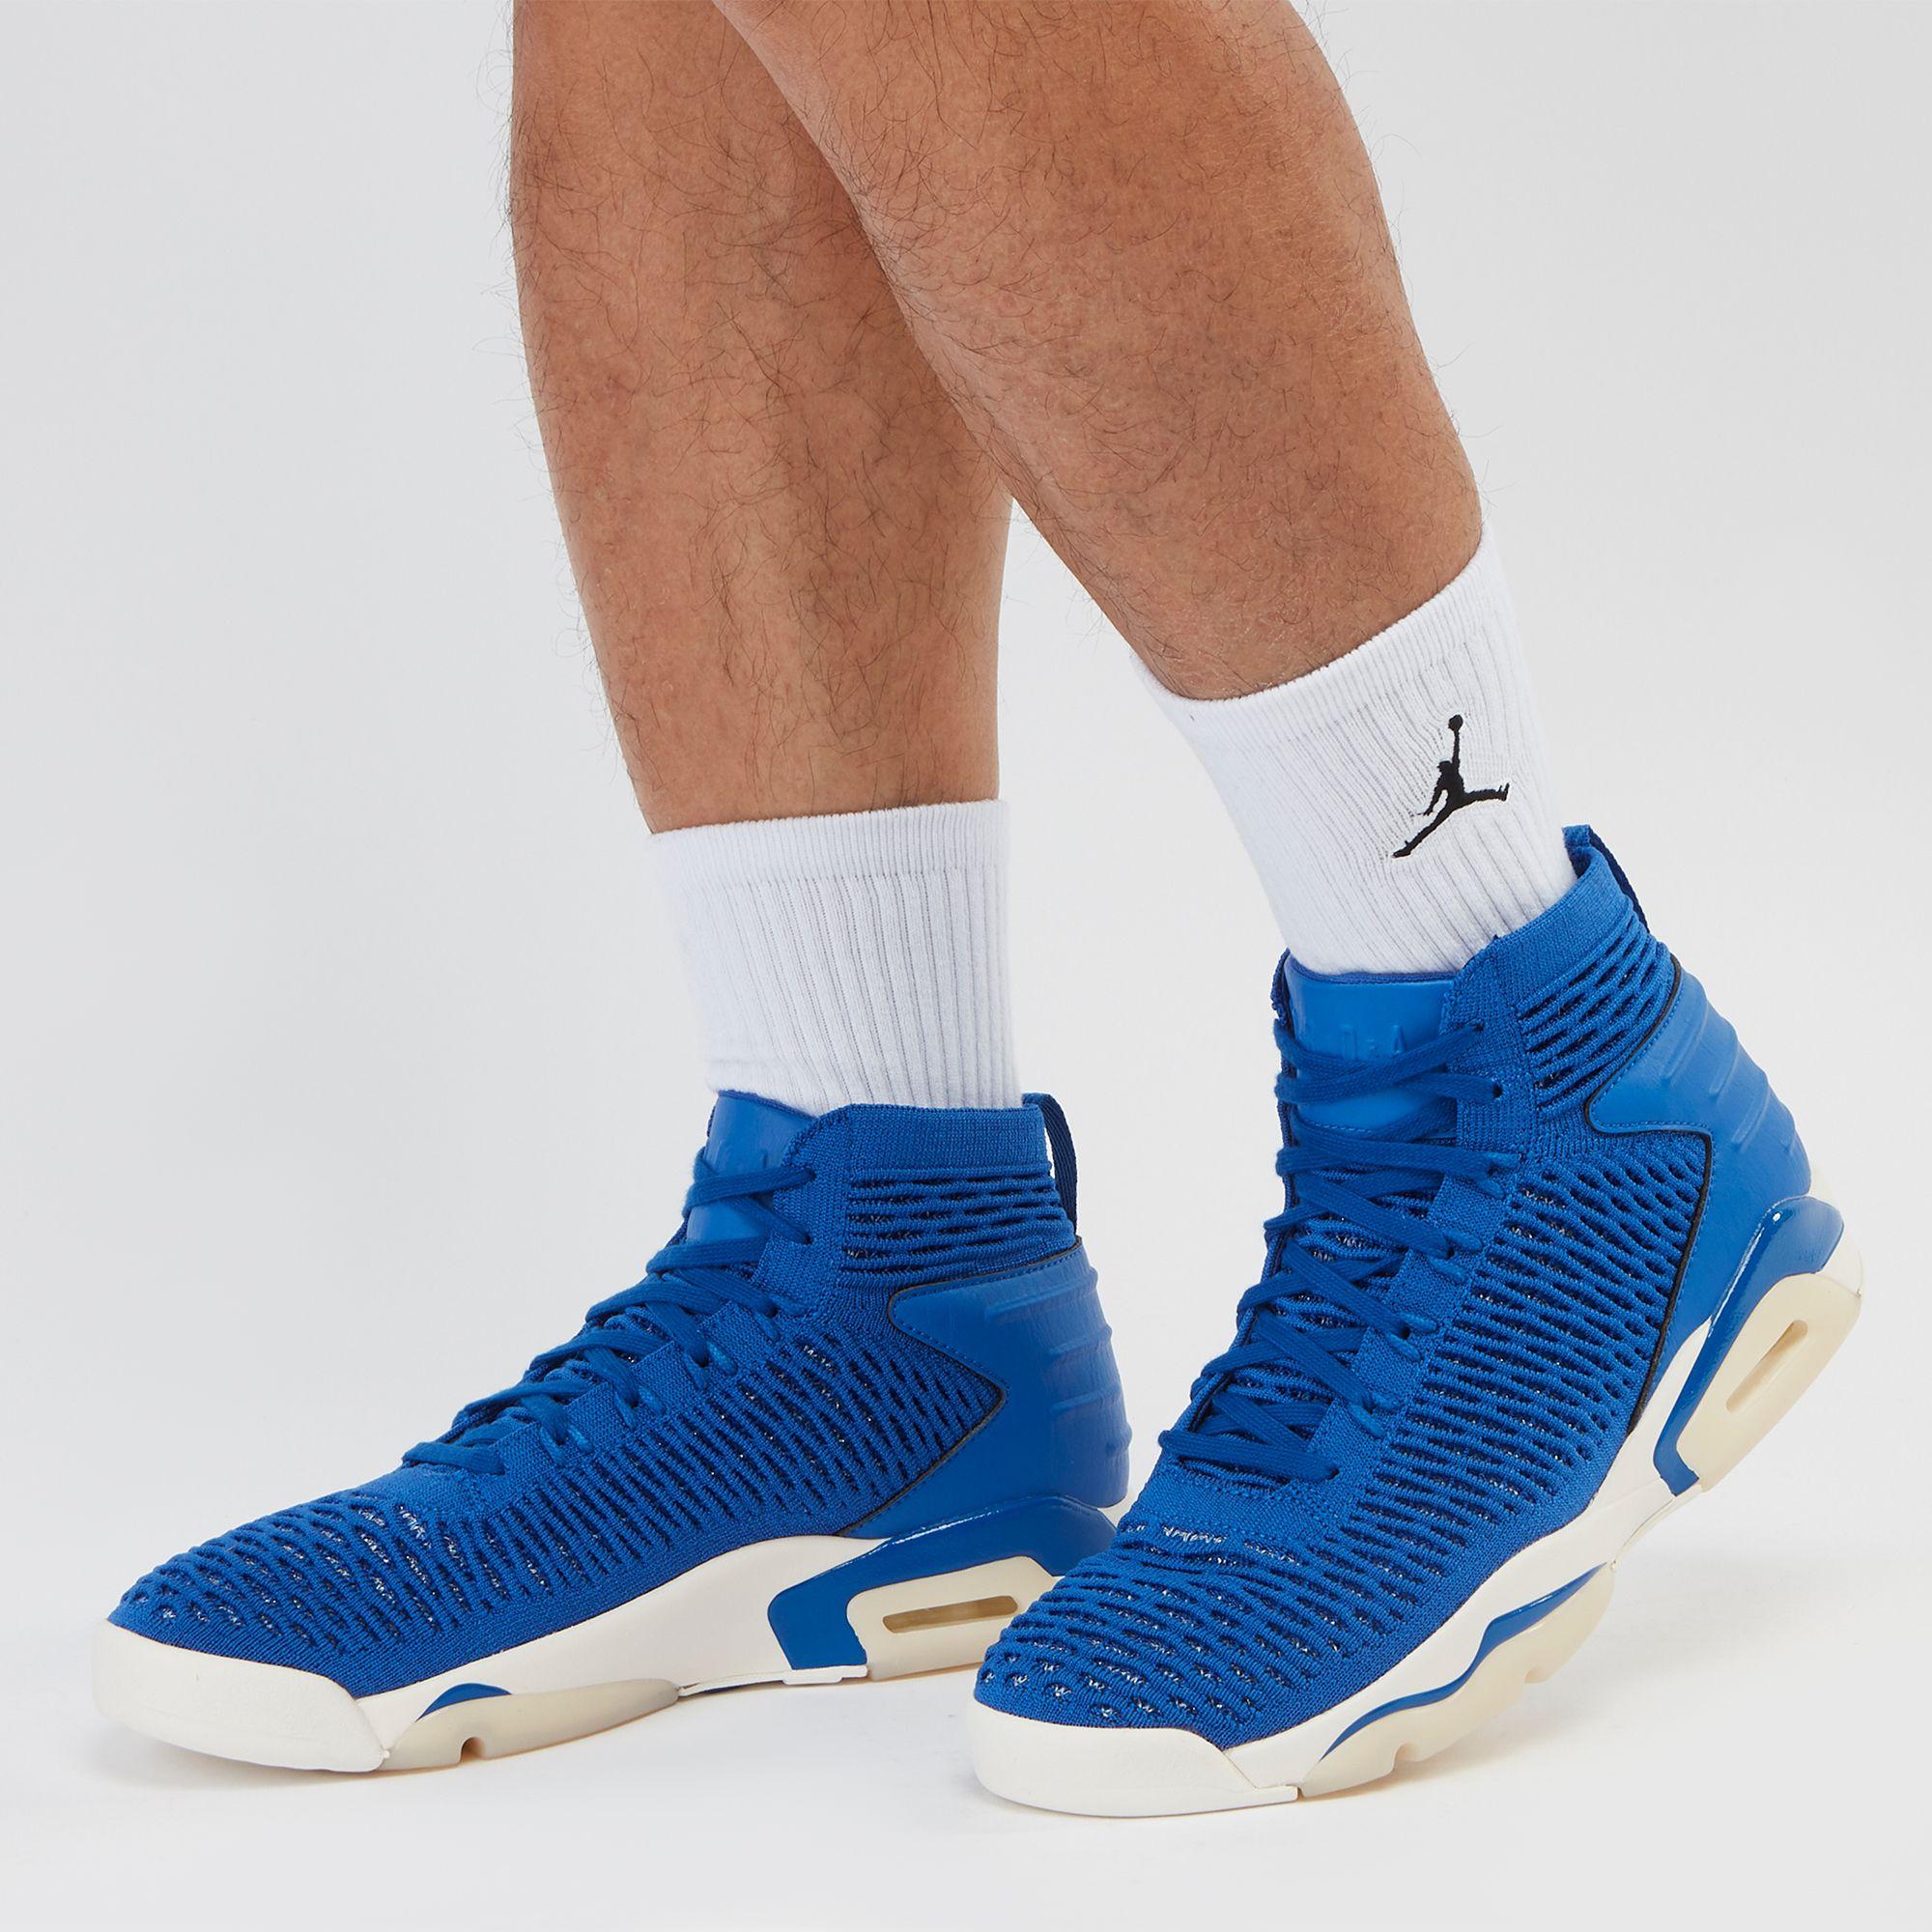 official photos 59f9c a8e17 Jordan Flyknit Elevation 23 Shoe   Basketball Shoes   Shoes   Men s ...